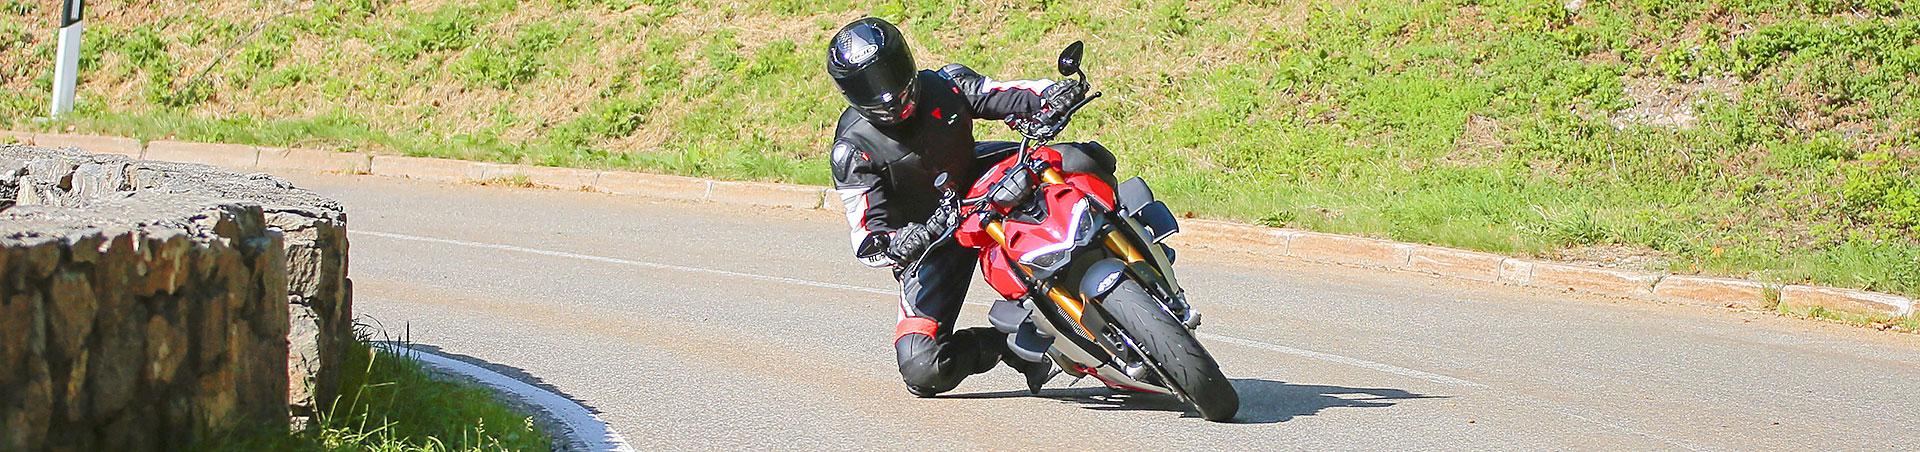 Titelbild-Ducati-Streetfighter-V4S_25-09-2020_89345